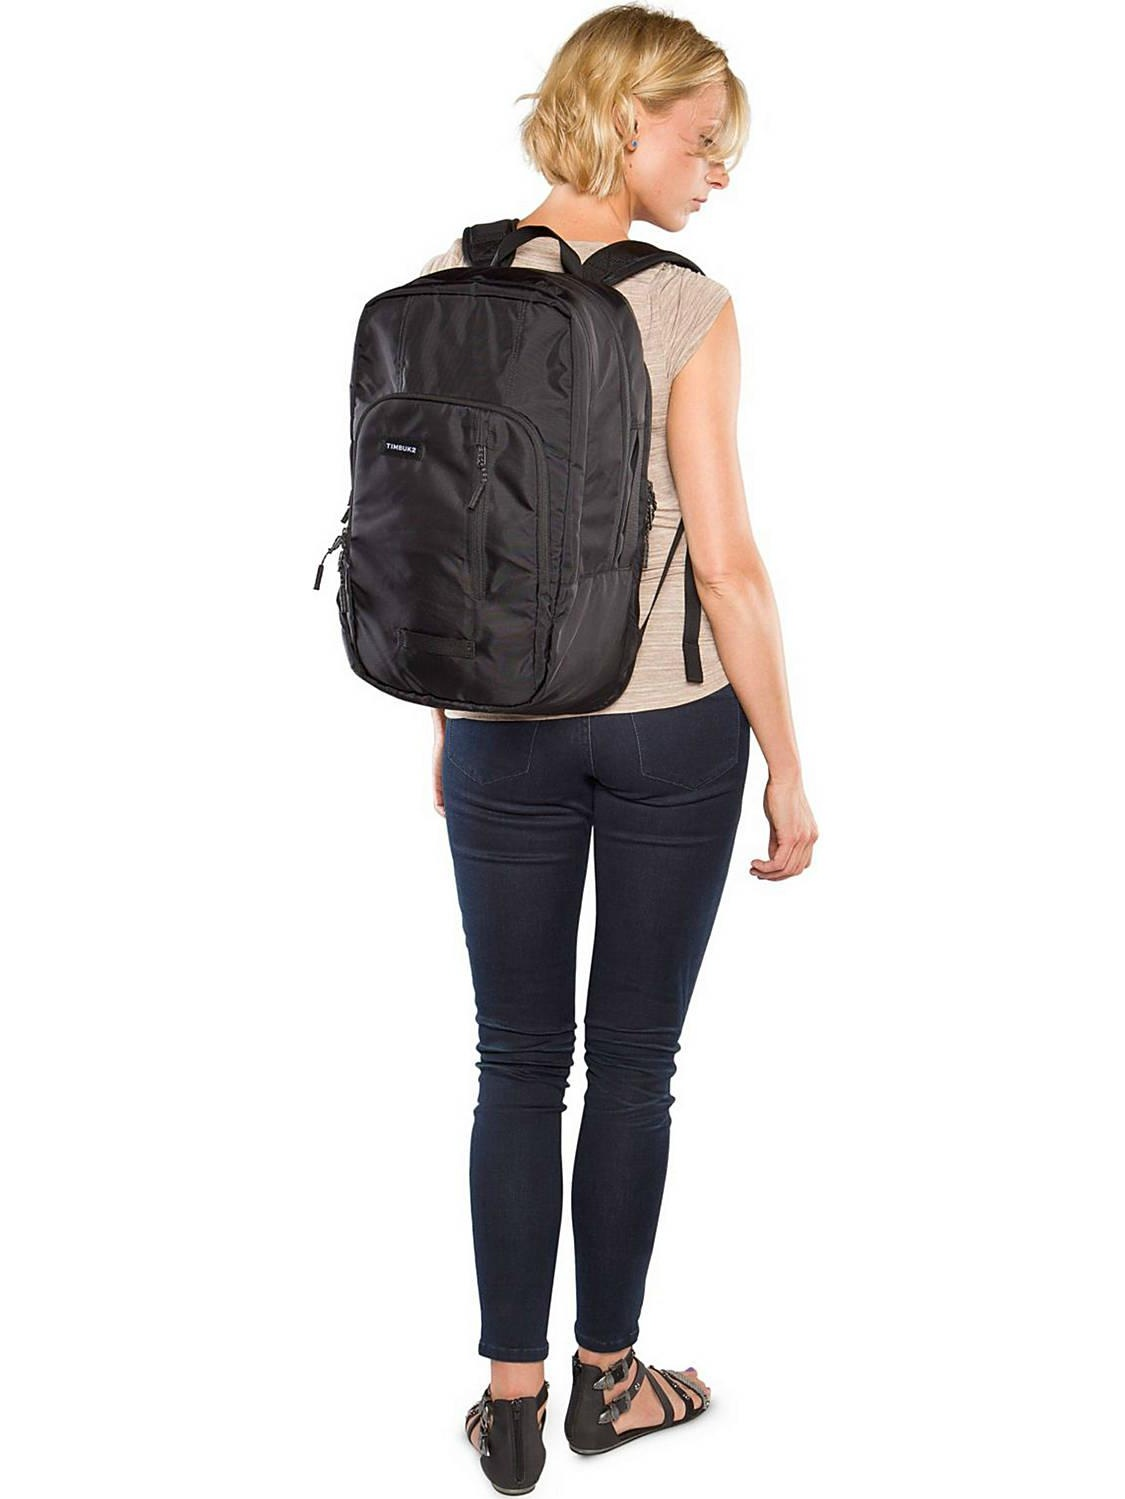 73db73aacc0 Timbuk2 - Timbuk2 Uptown Laptop Backpack - Walmart.com